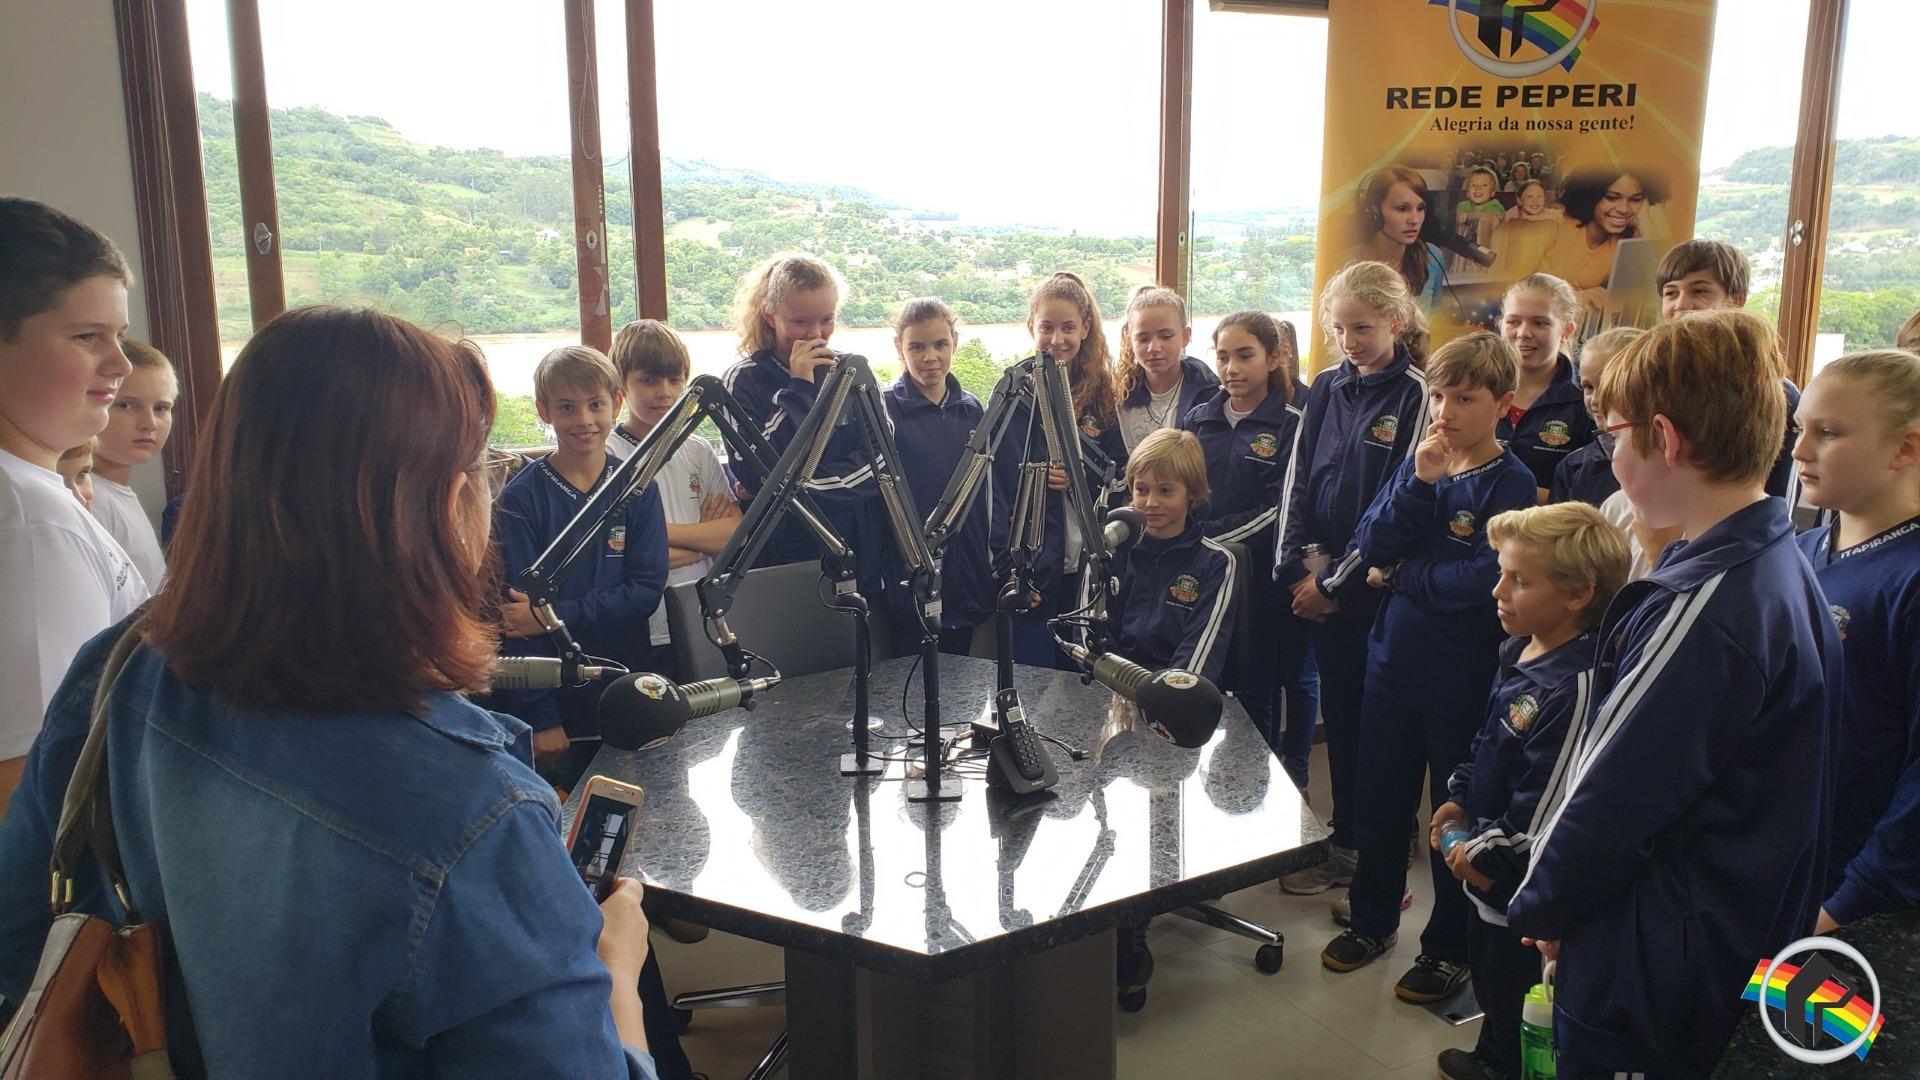 Alunos de escola do interior visitam Rádio Itapiranga